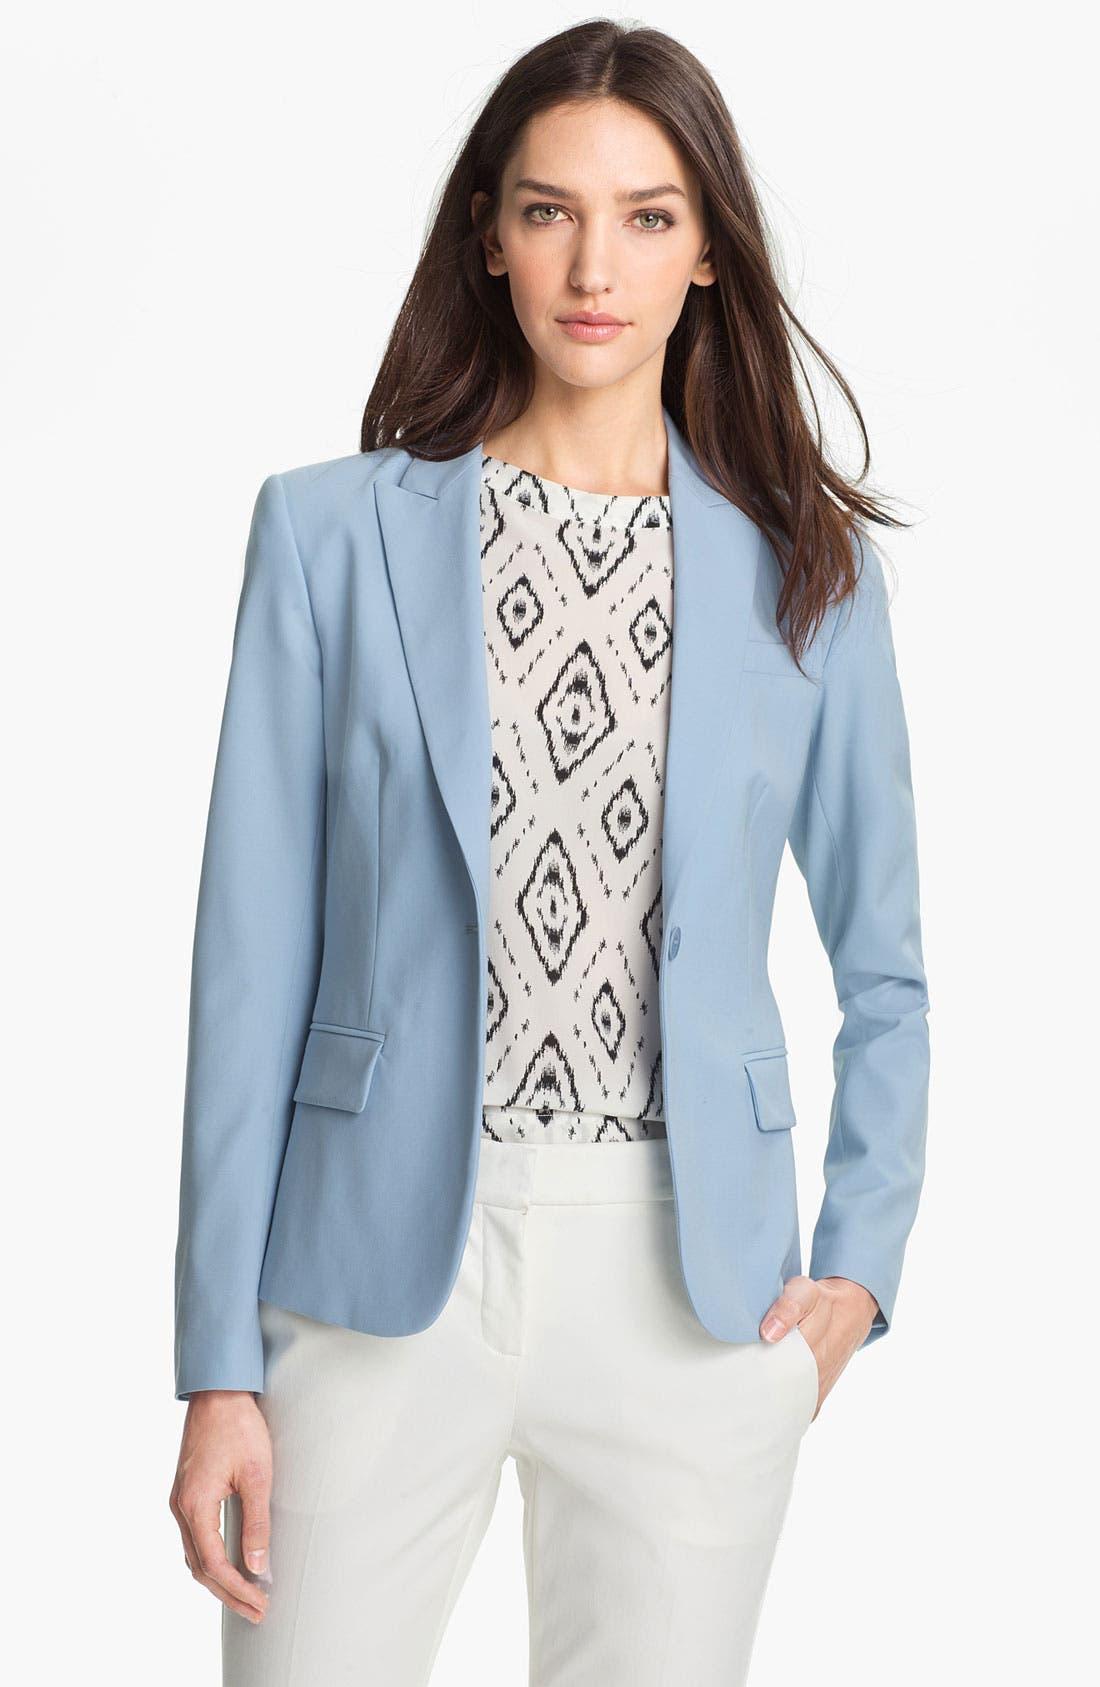 Alternate Image 1 Selected - Theory 'Gabe B - Tailor' Jacket